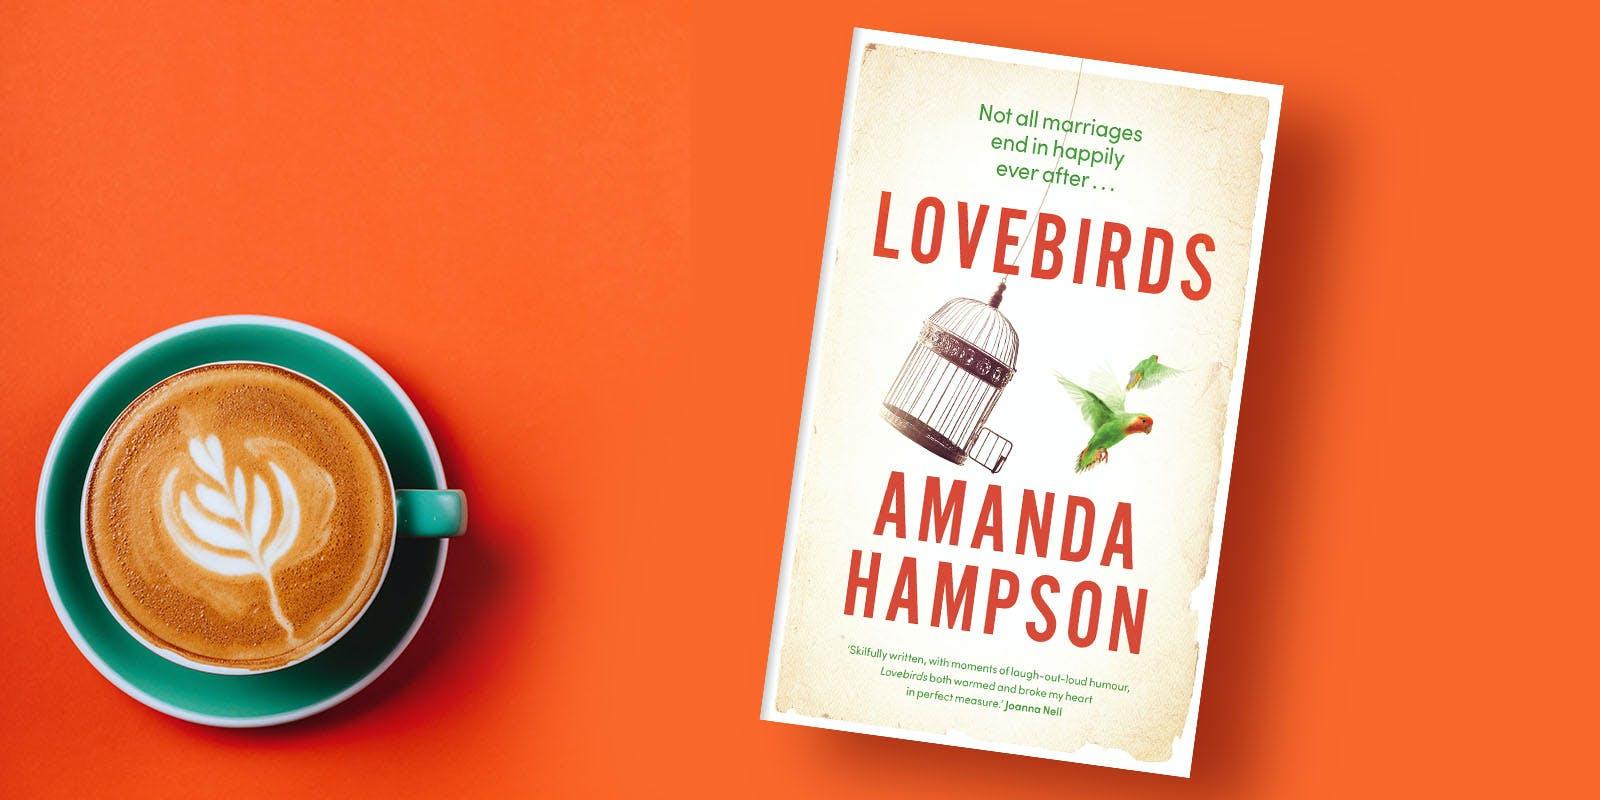 Lovebirds book club notes